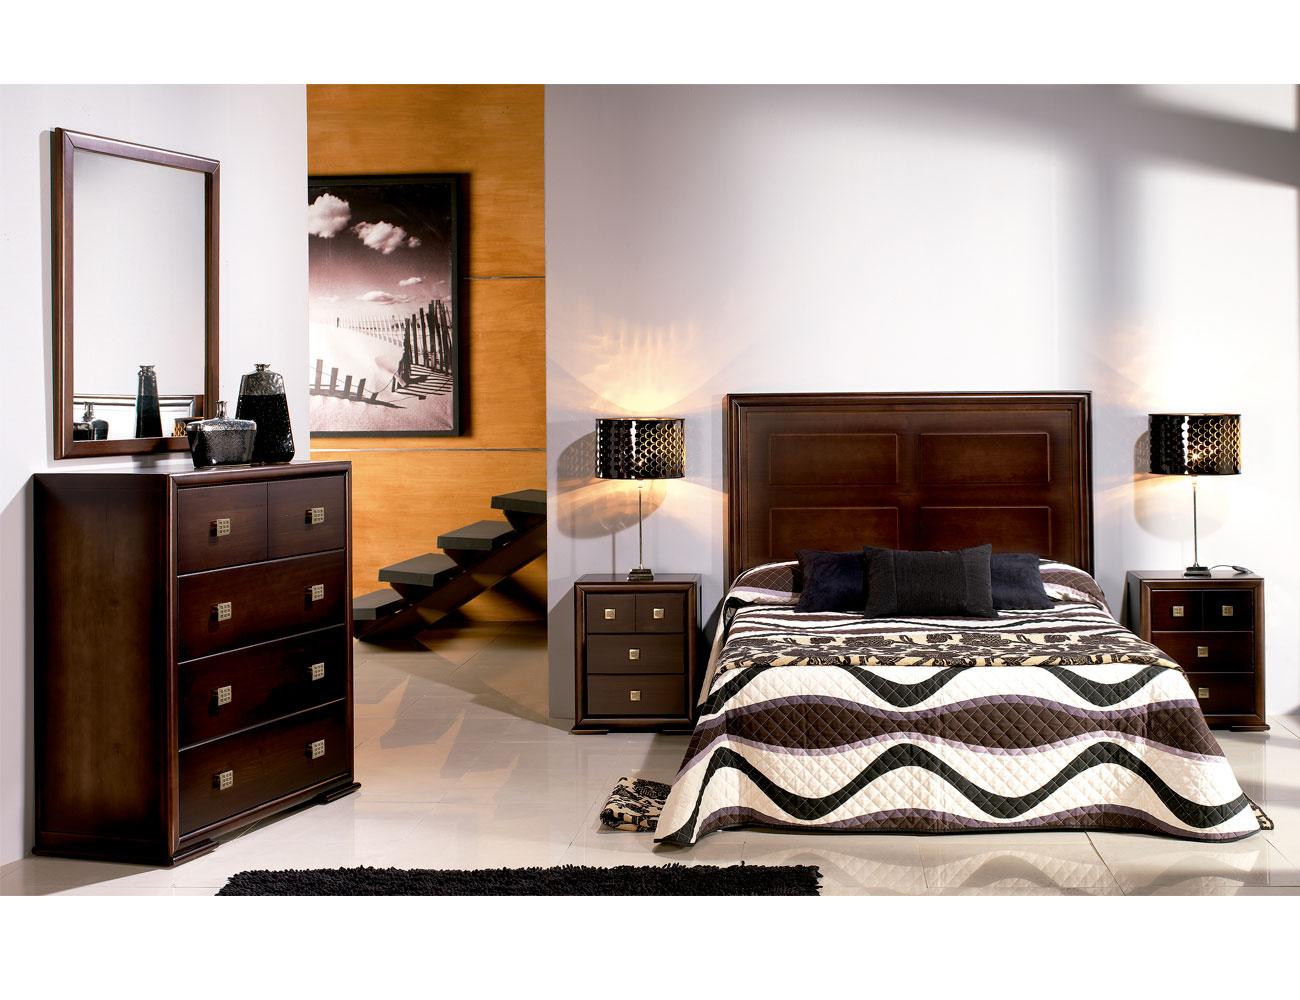 Composicion01 dormitorio matrimonio comoda madera2